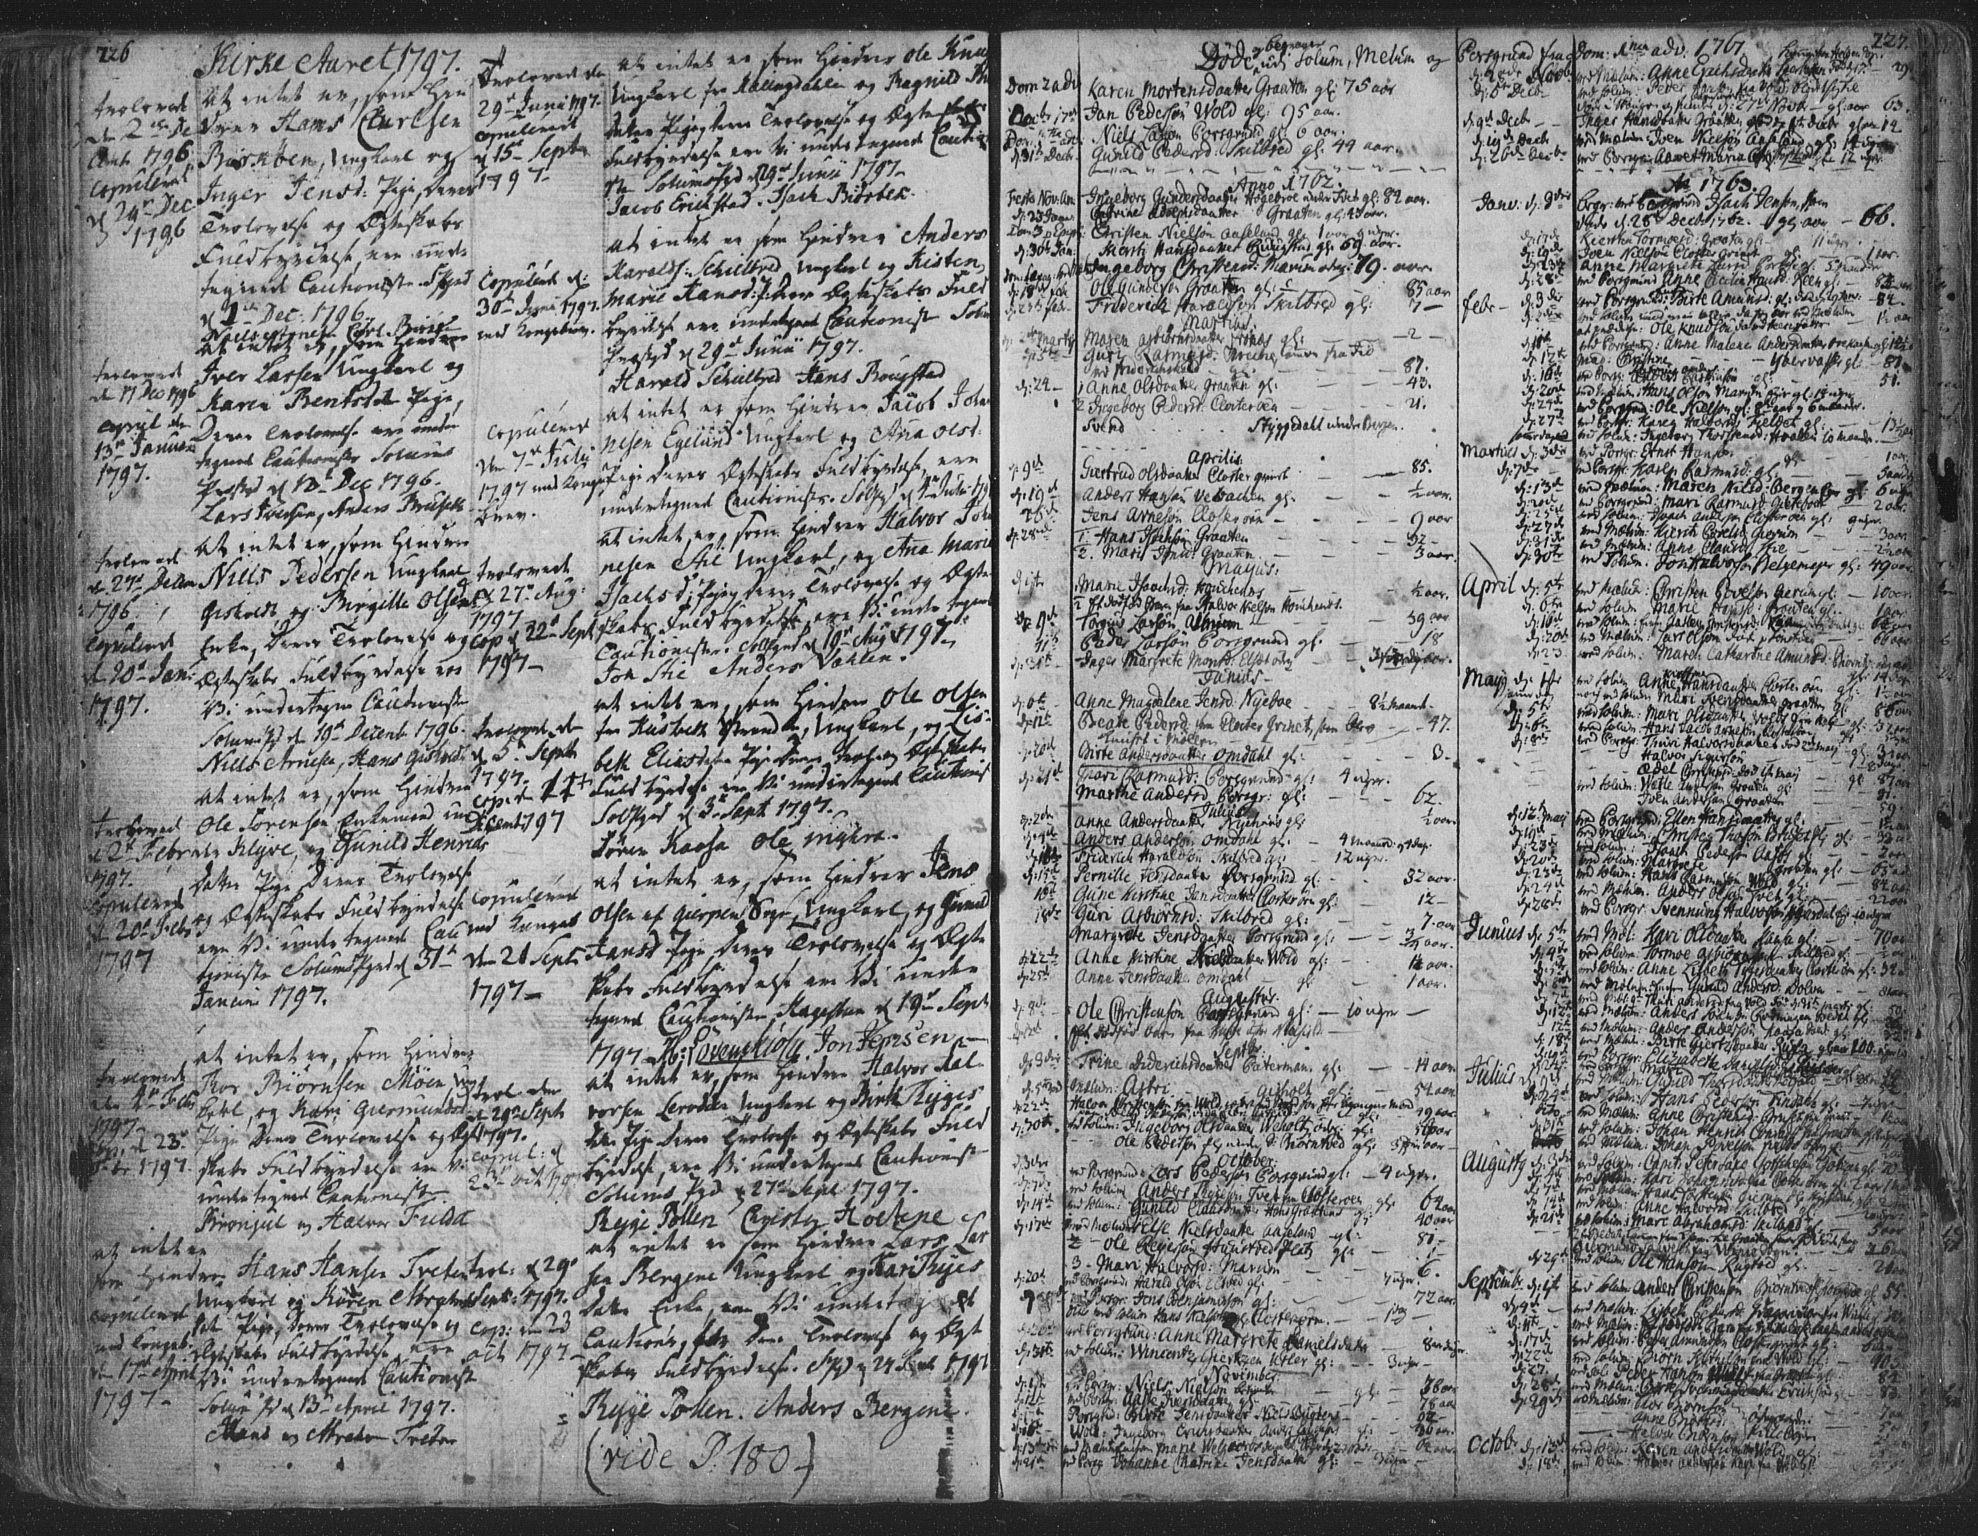 SAKO, Solum kirkebøker, F/Fa/L0003: Ministerialbok nr. I 3, 1761-1814, s. 226-227